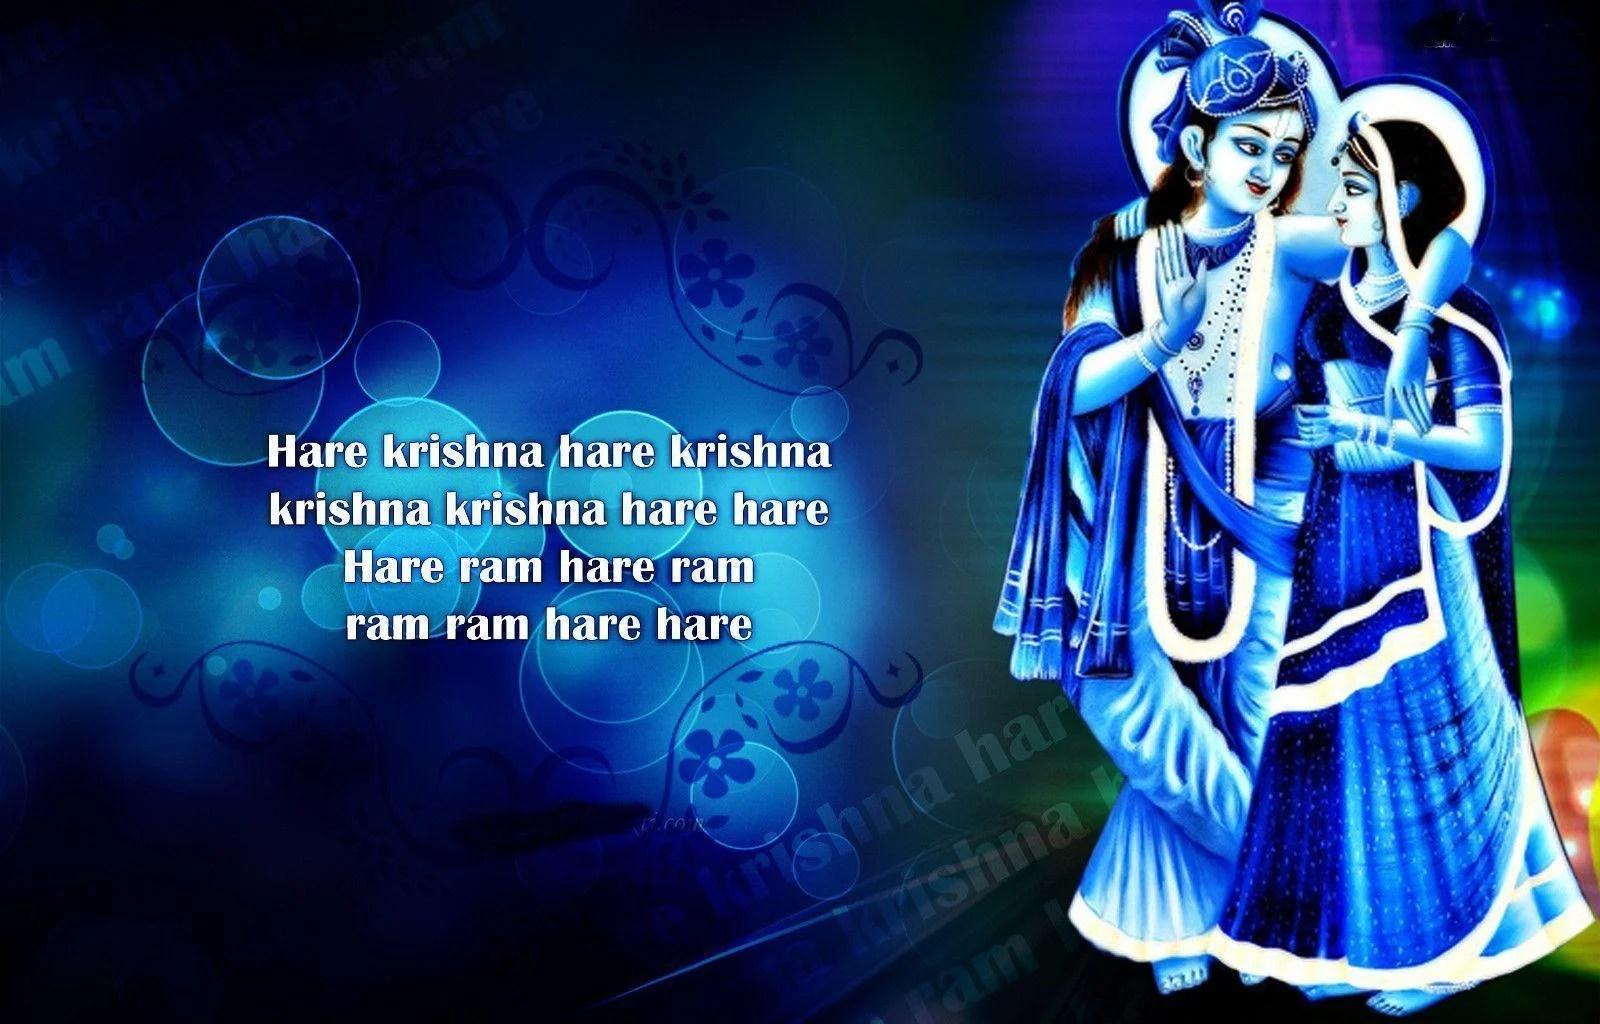 True Love Quotes Wallpaper In Hindi Krishna Wallpapers Wallpaper Cave